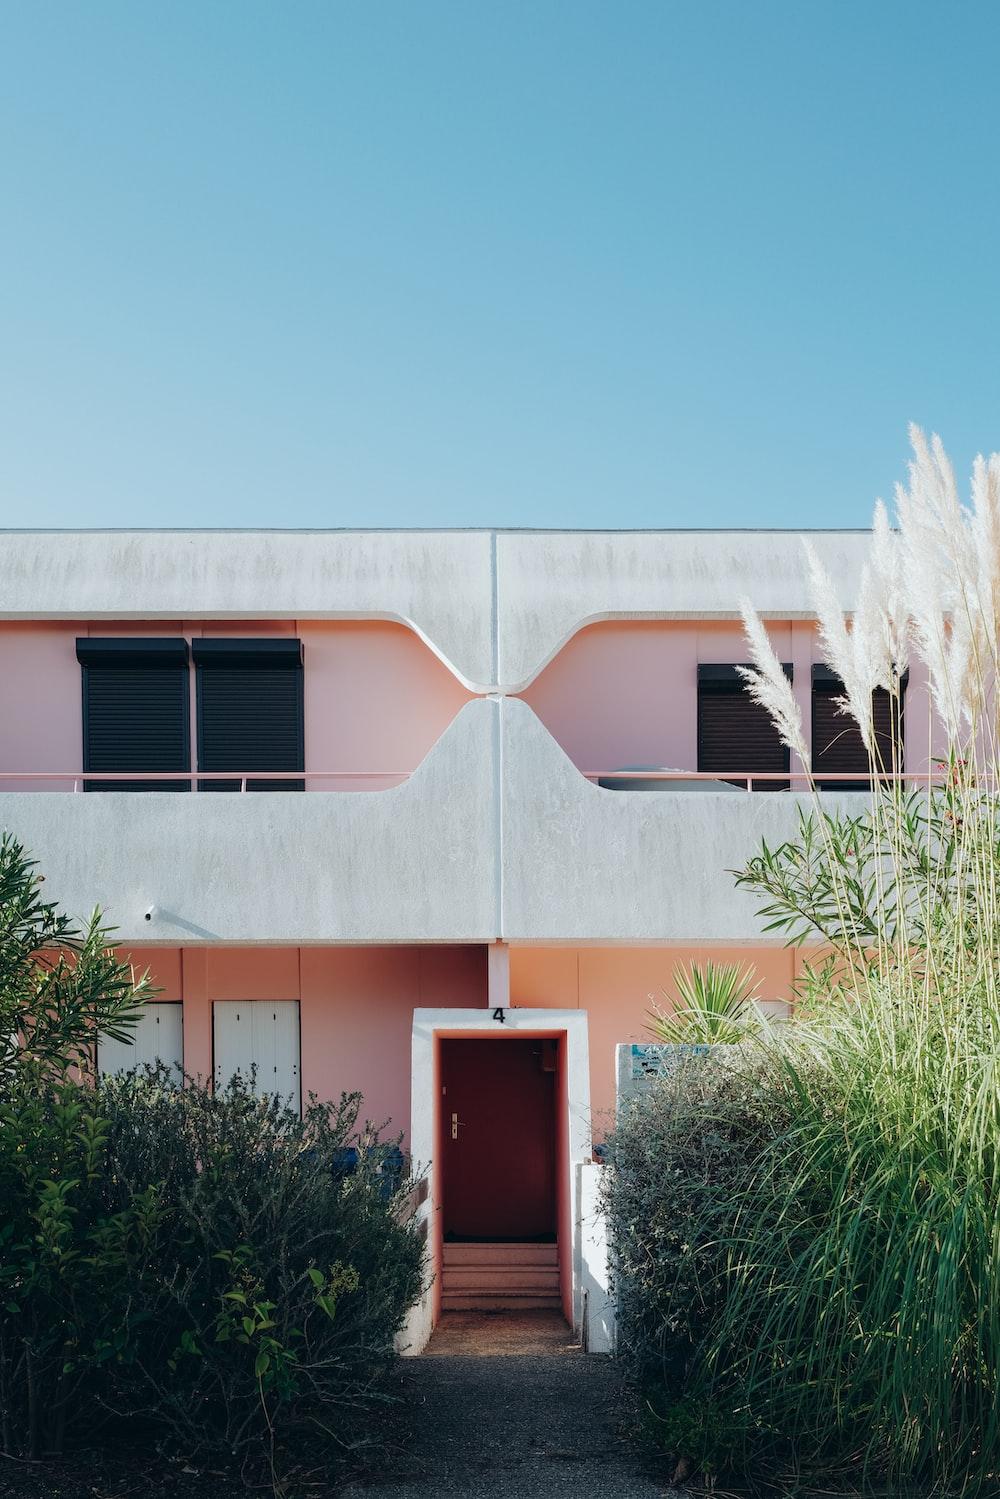 green plants beside pink concrete house